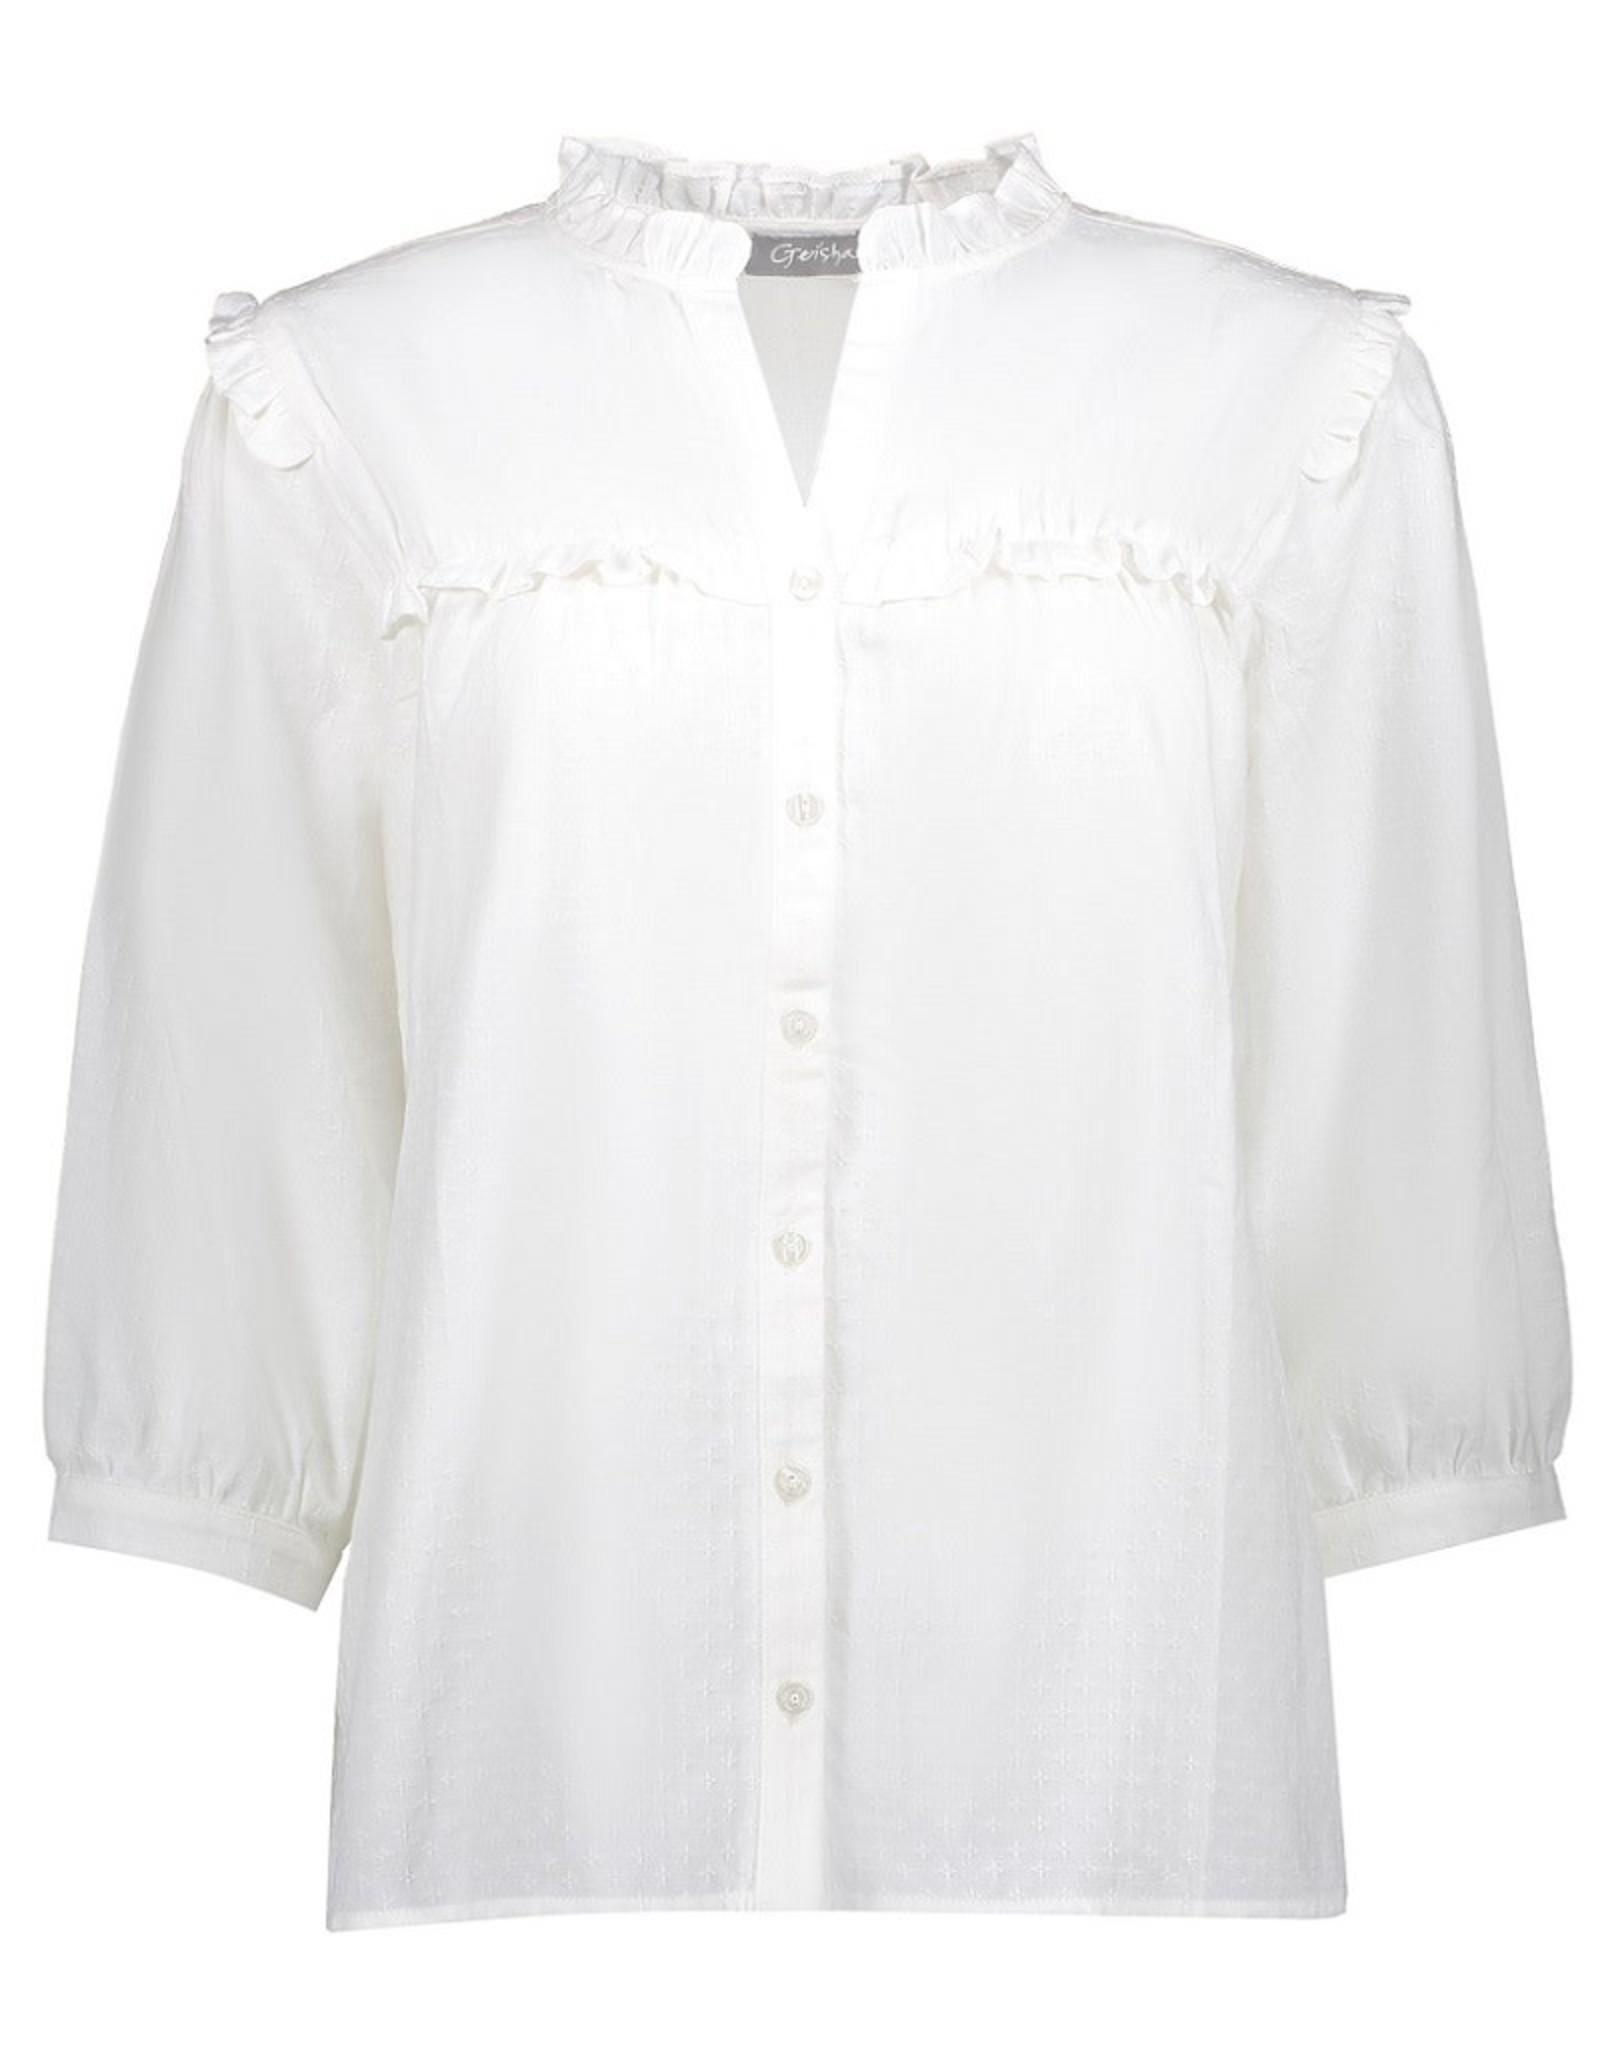 Geisha Geisha blouse off white